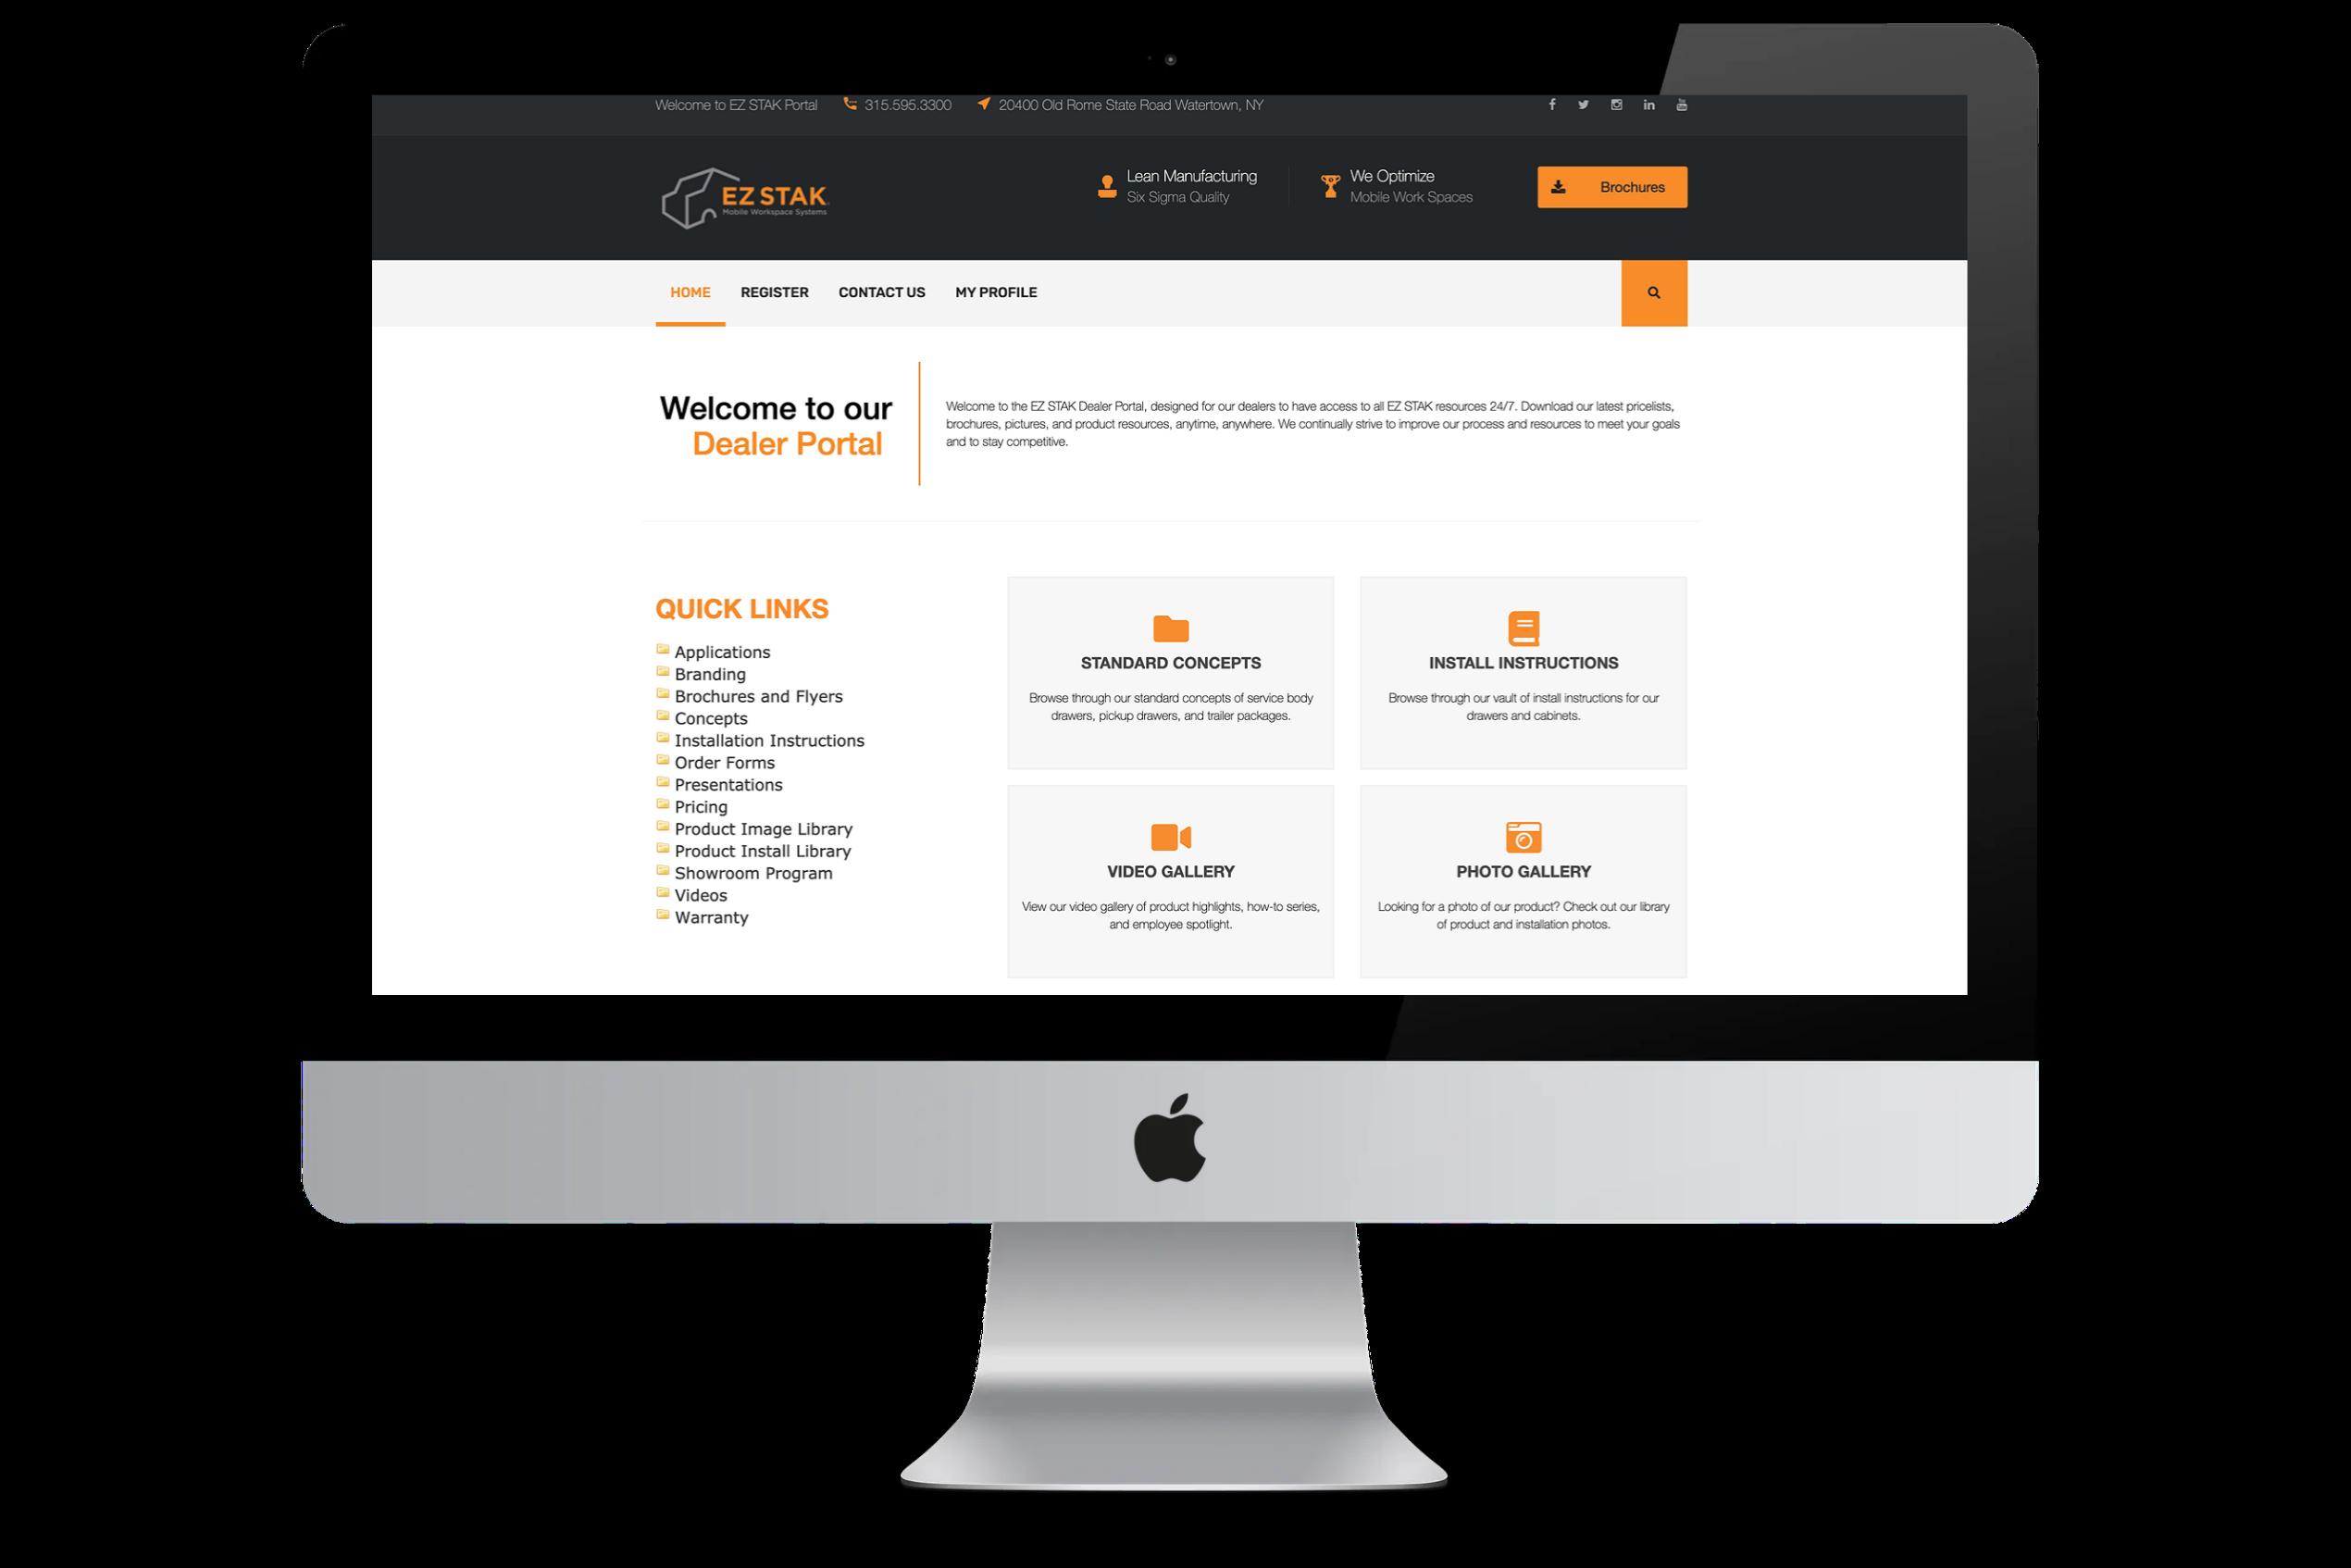 EZ STAK Dealer Portal